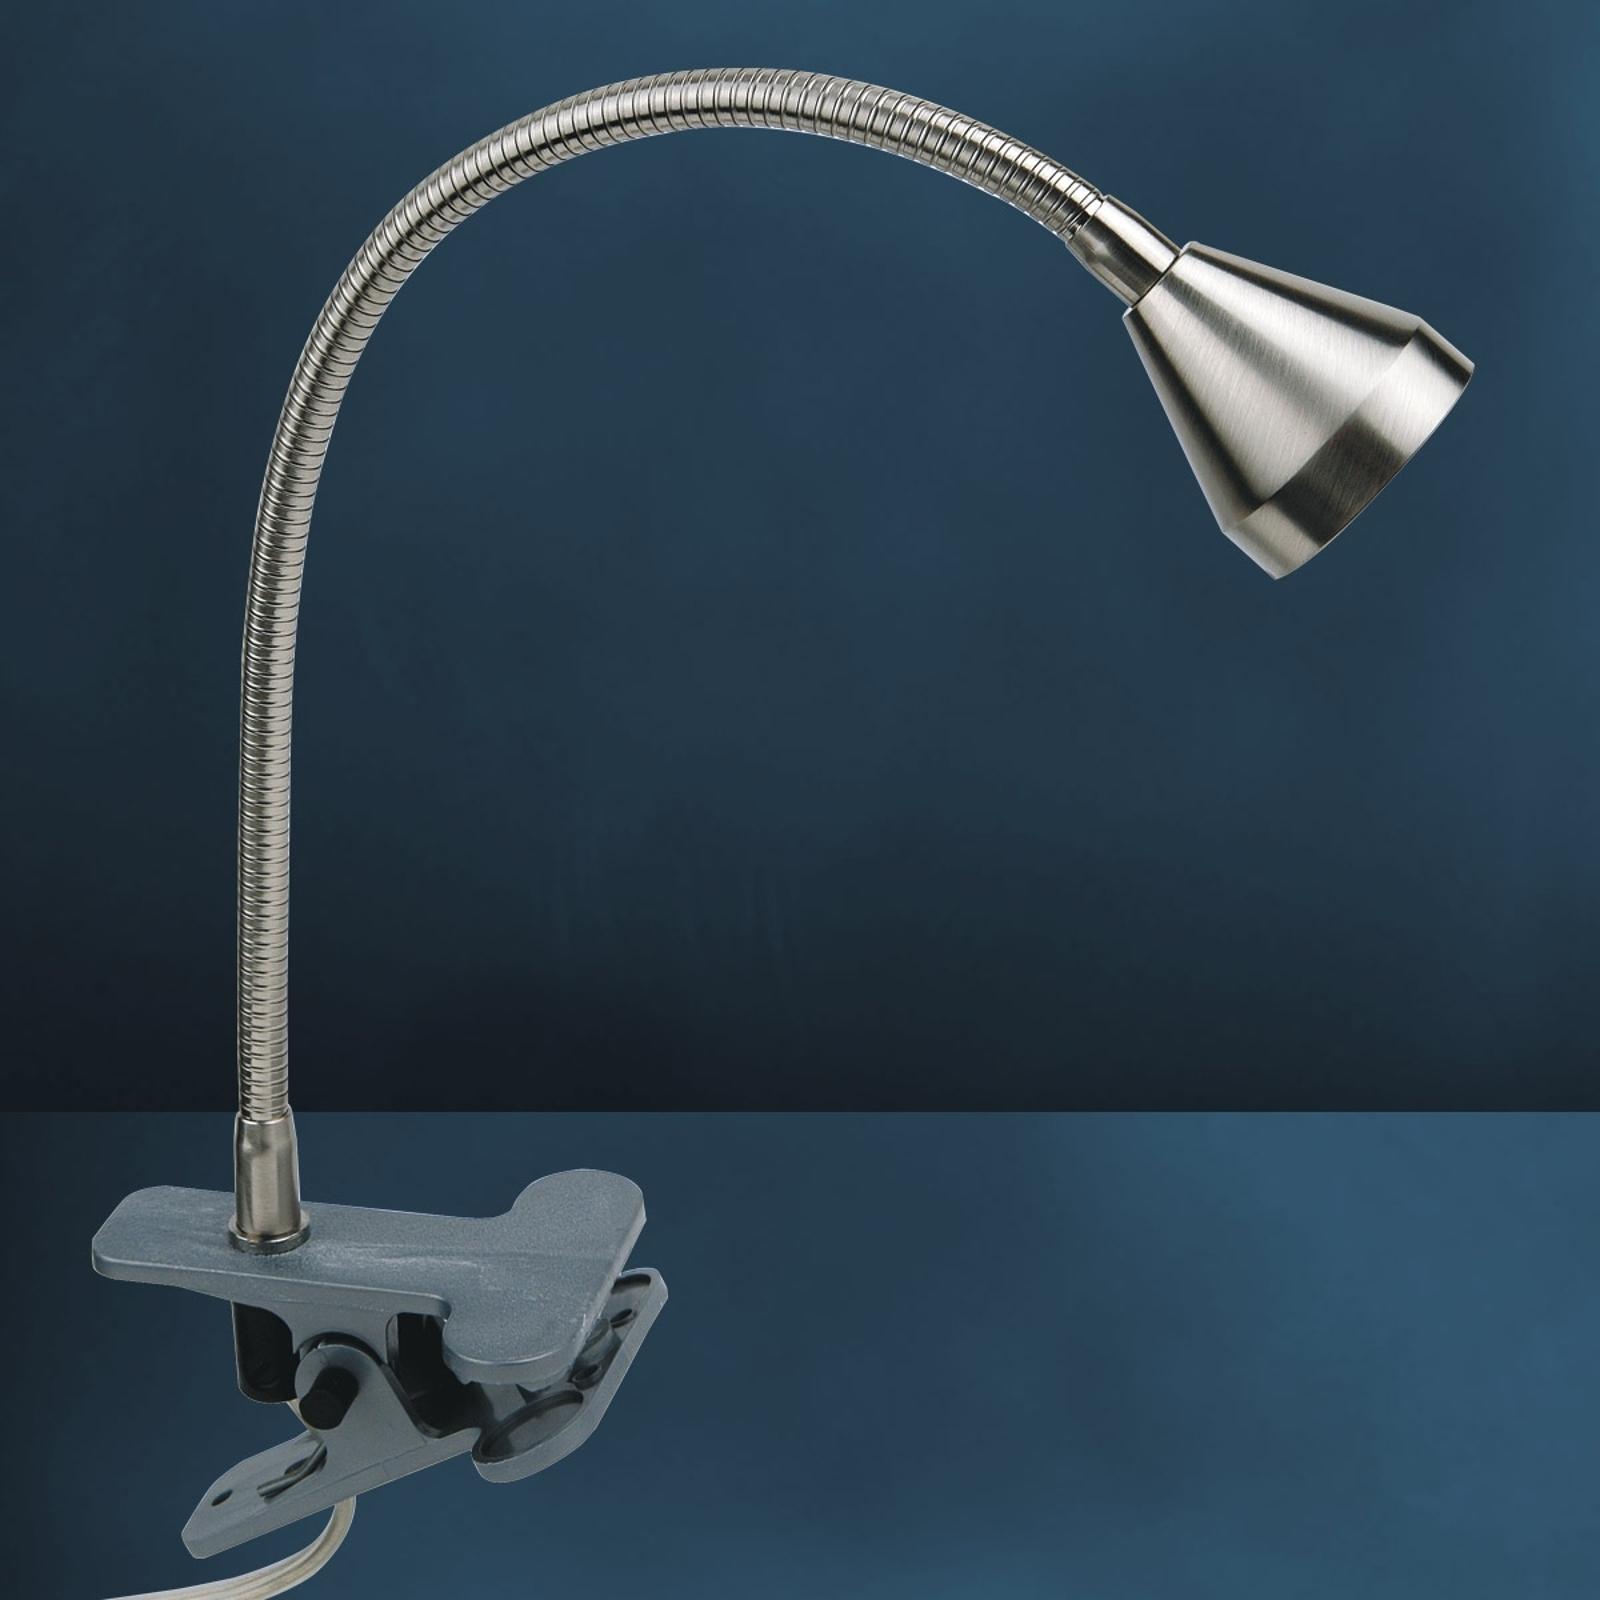 Funktionale LED-Klemmleuchte MINI, universalweiß